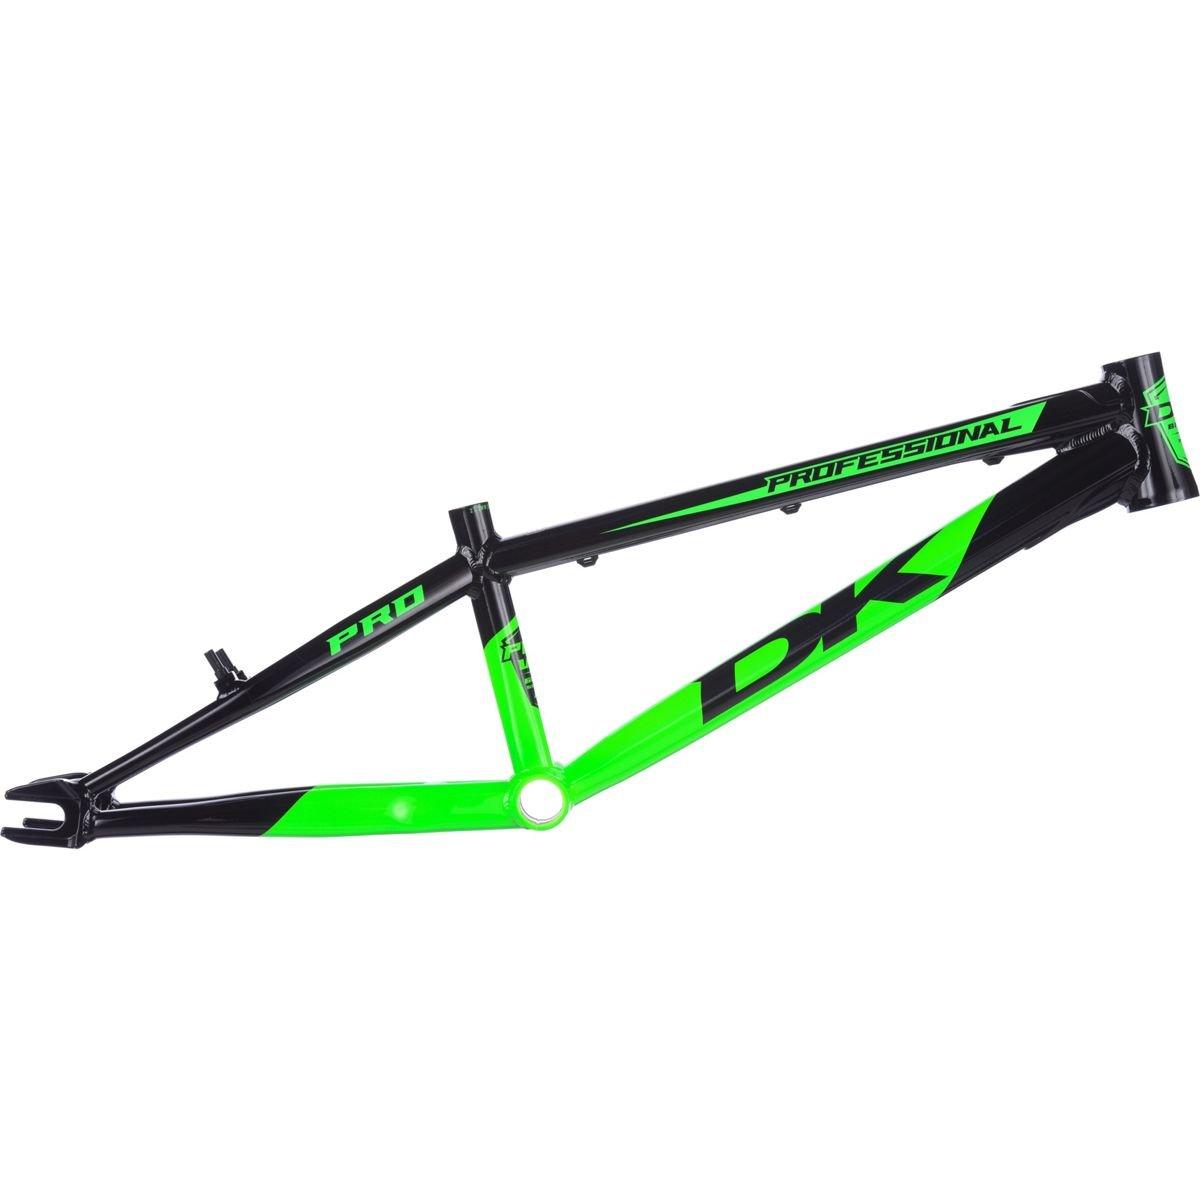 DK BICYCLES DK Professional V2 Pro BMX-Rahmen 2016 PF30 Innenlager ...